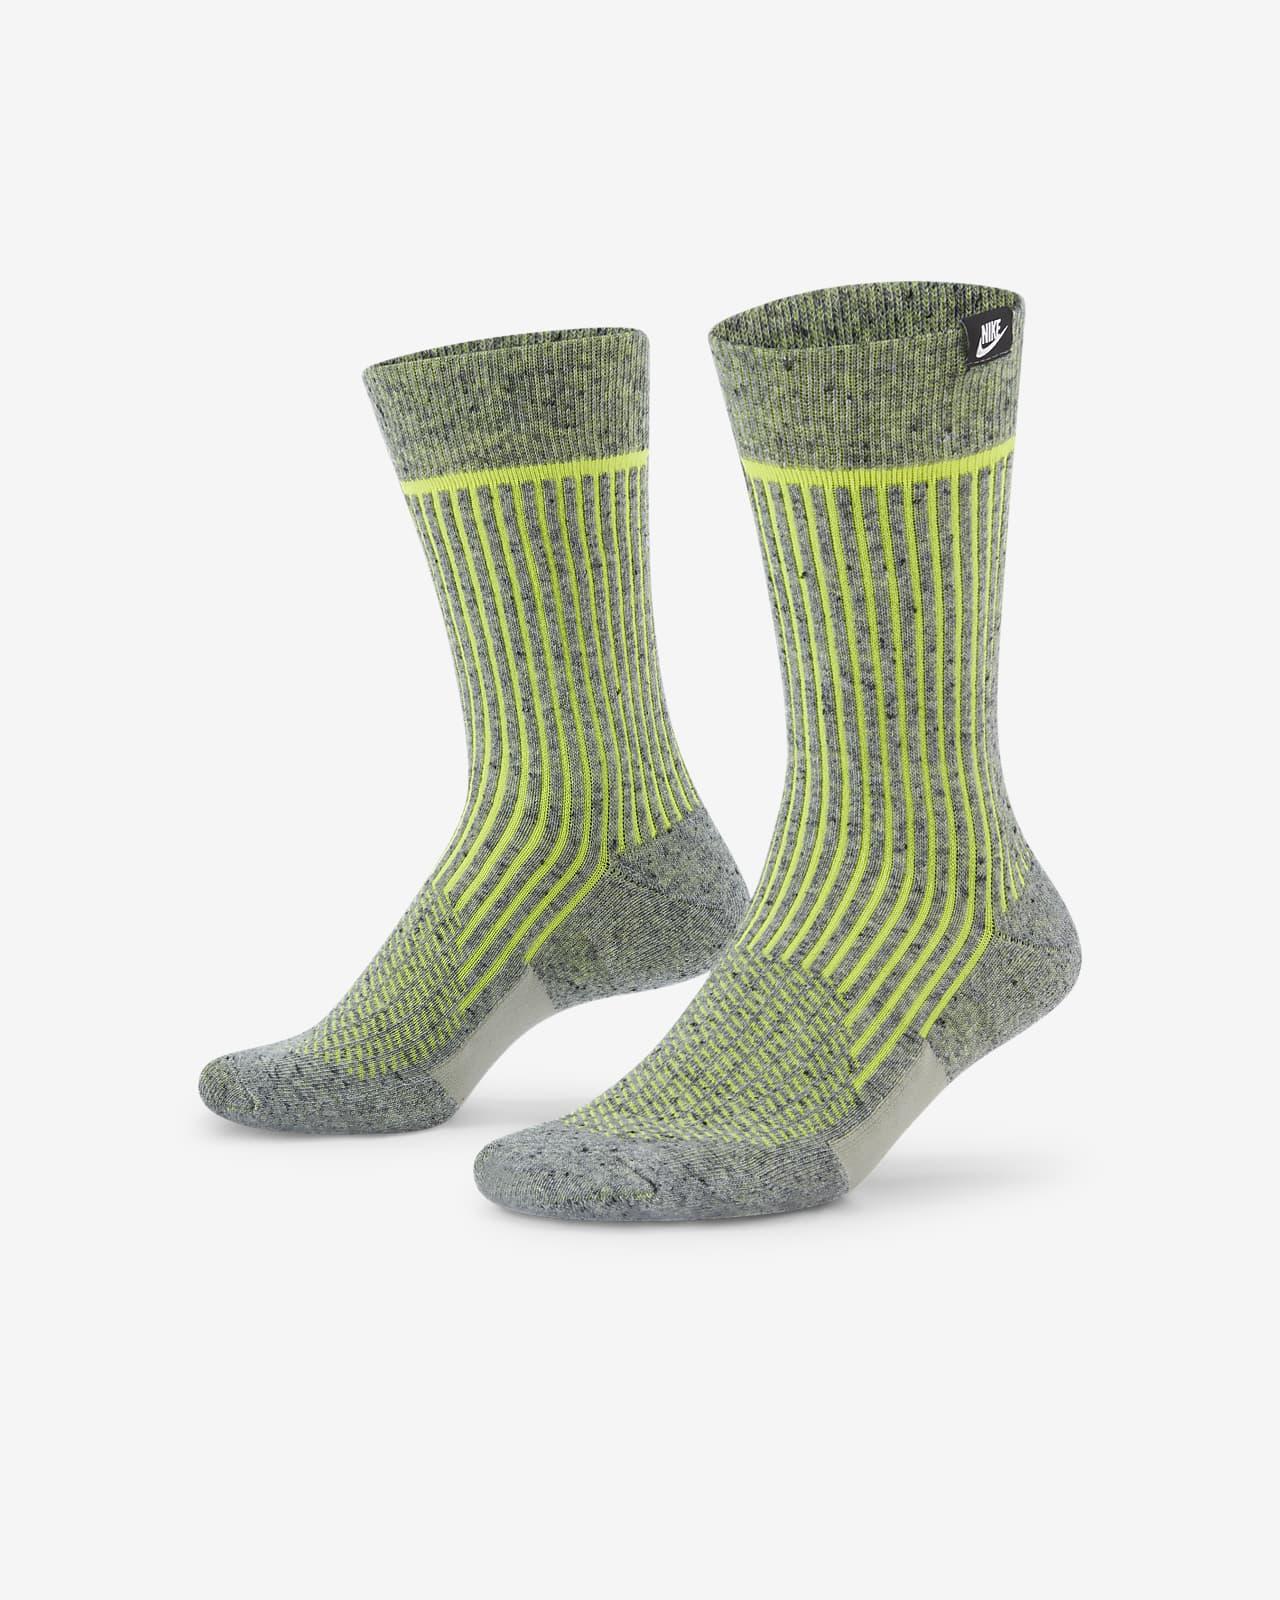 Nike SNEAKR Sox Crew Socks